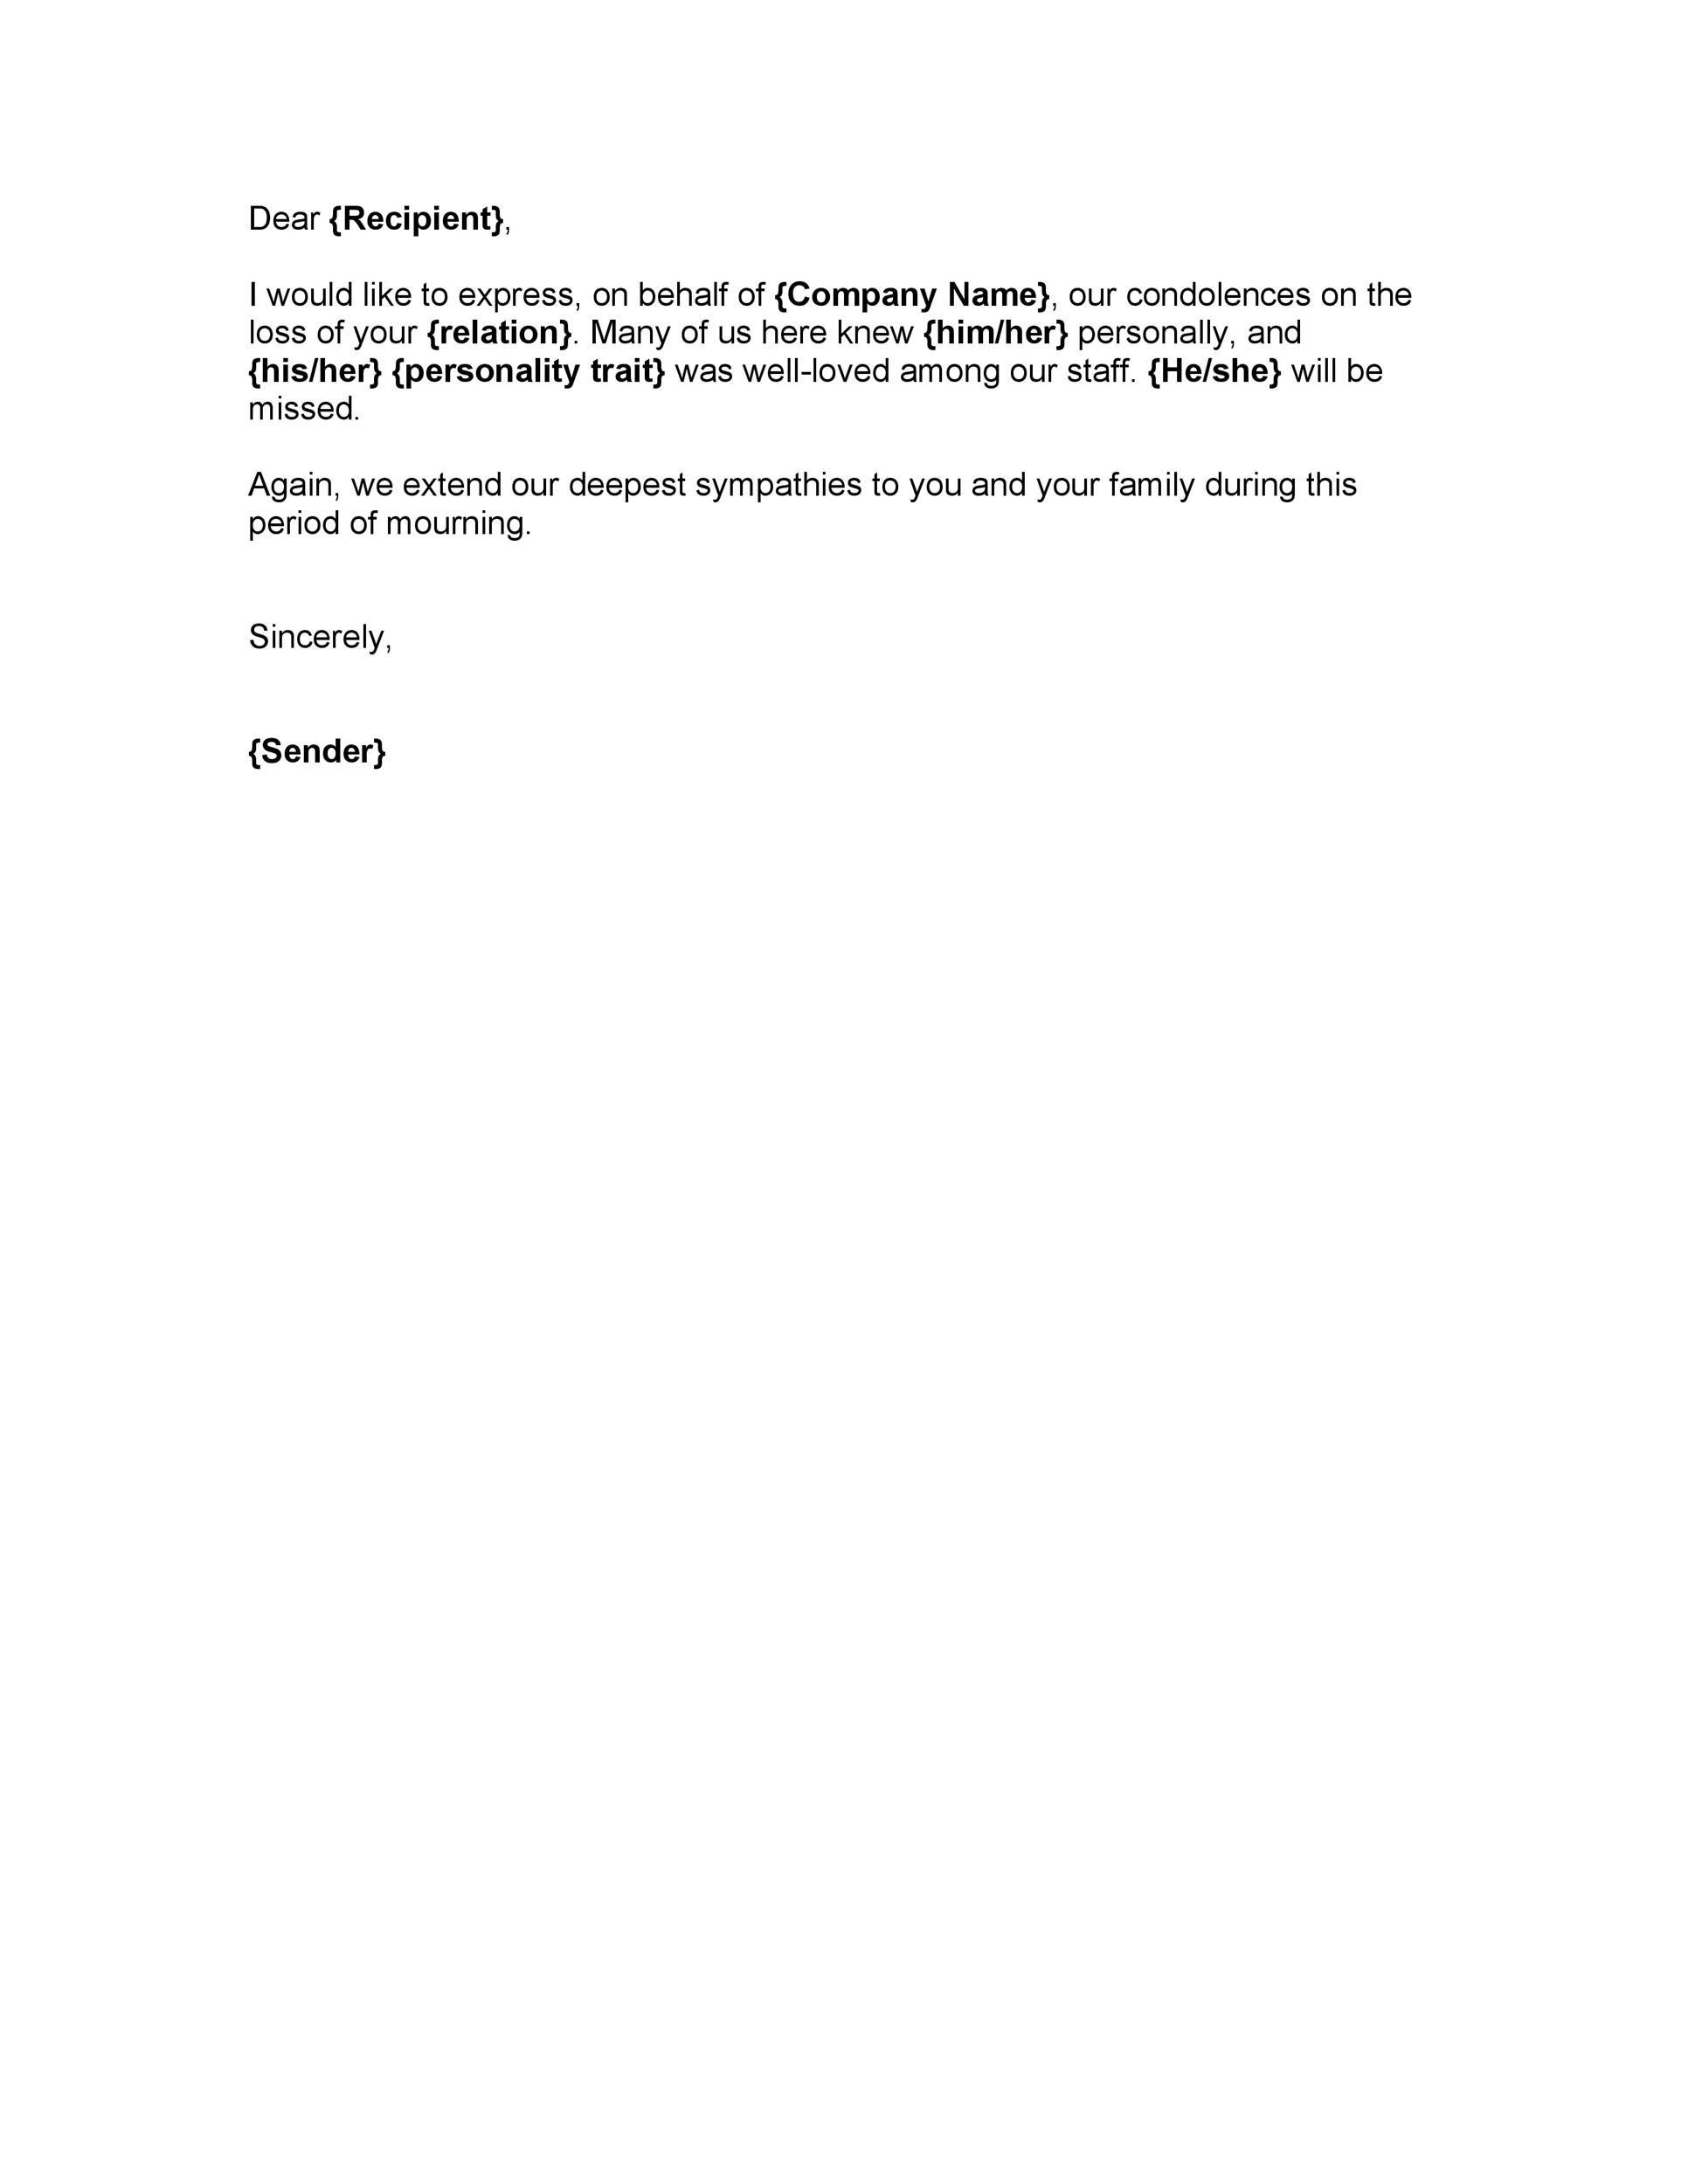 41 Condolence Sympathy Letter Samples ᐅ Templatelab